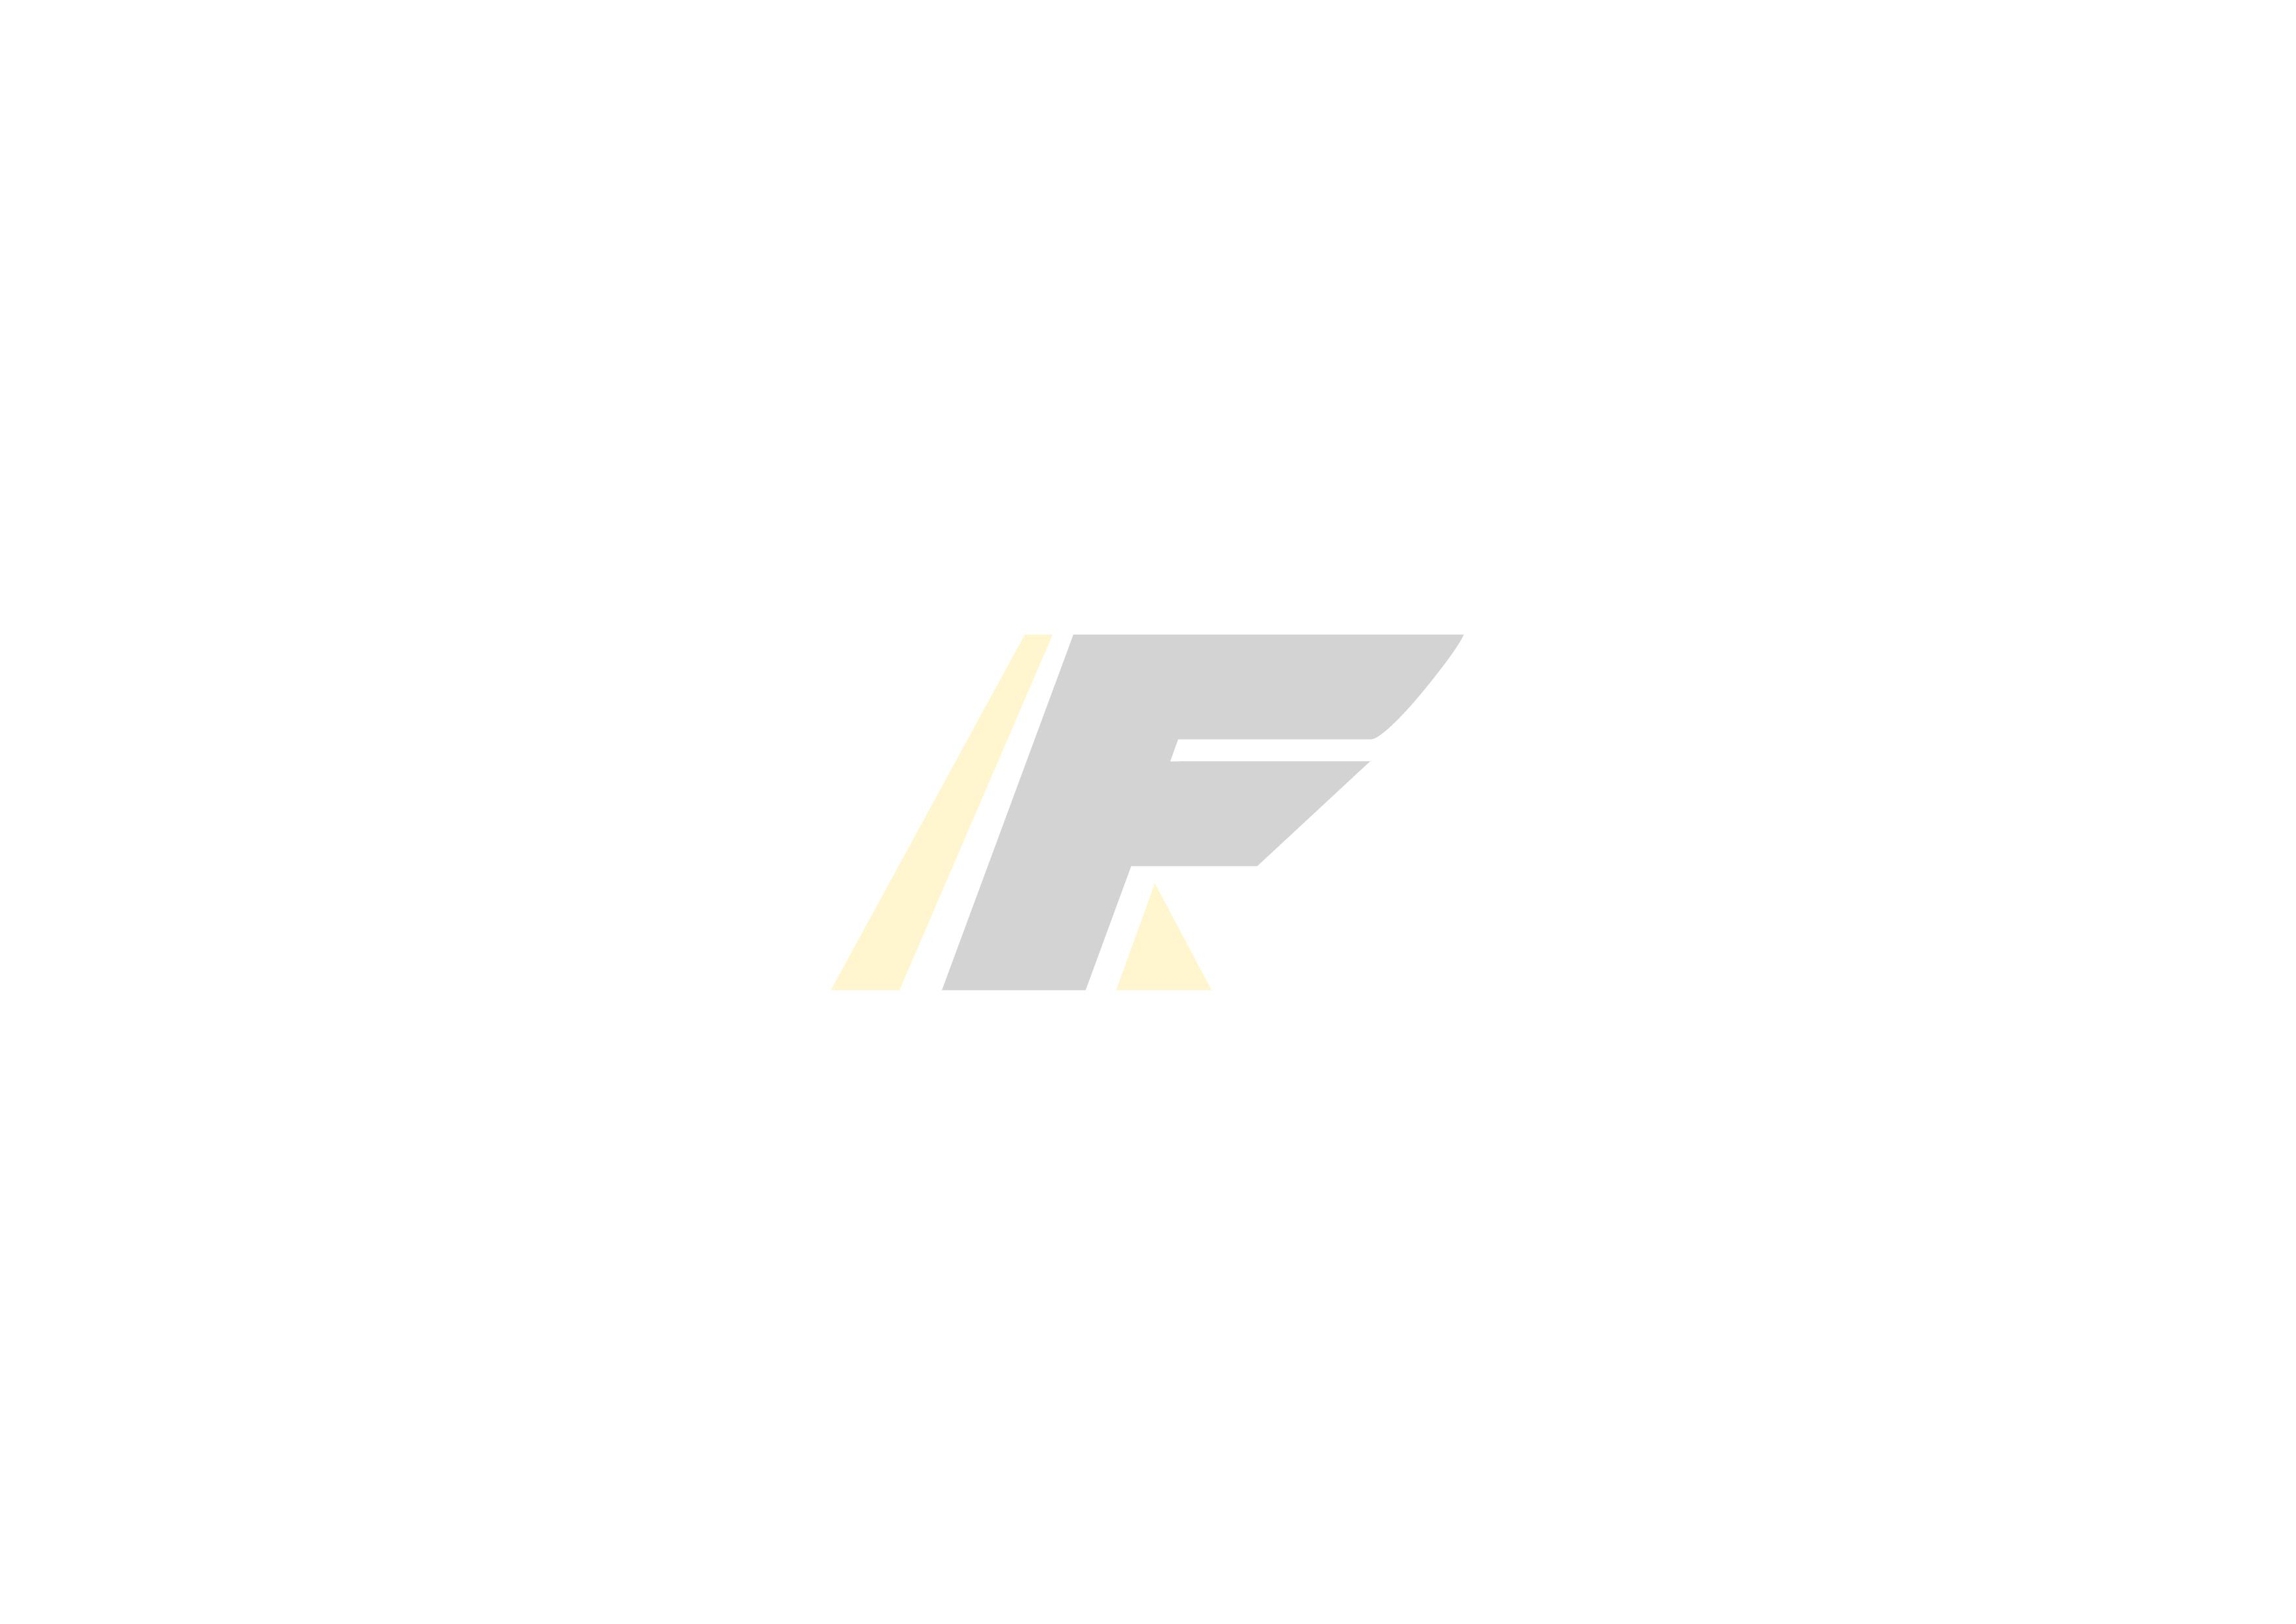 R&G Swingarm Protectors - KTM EXC/ SMC/ SMR